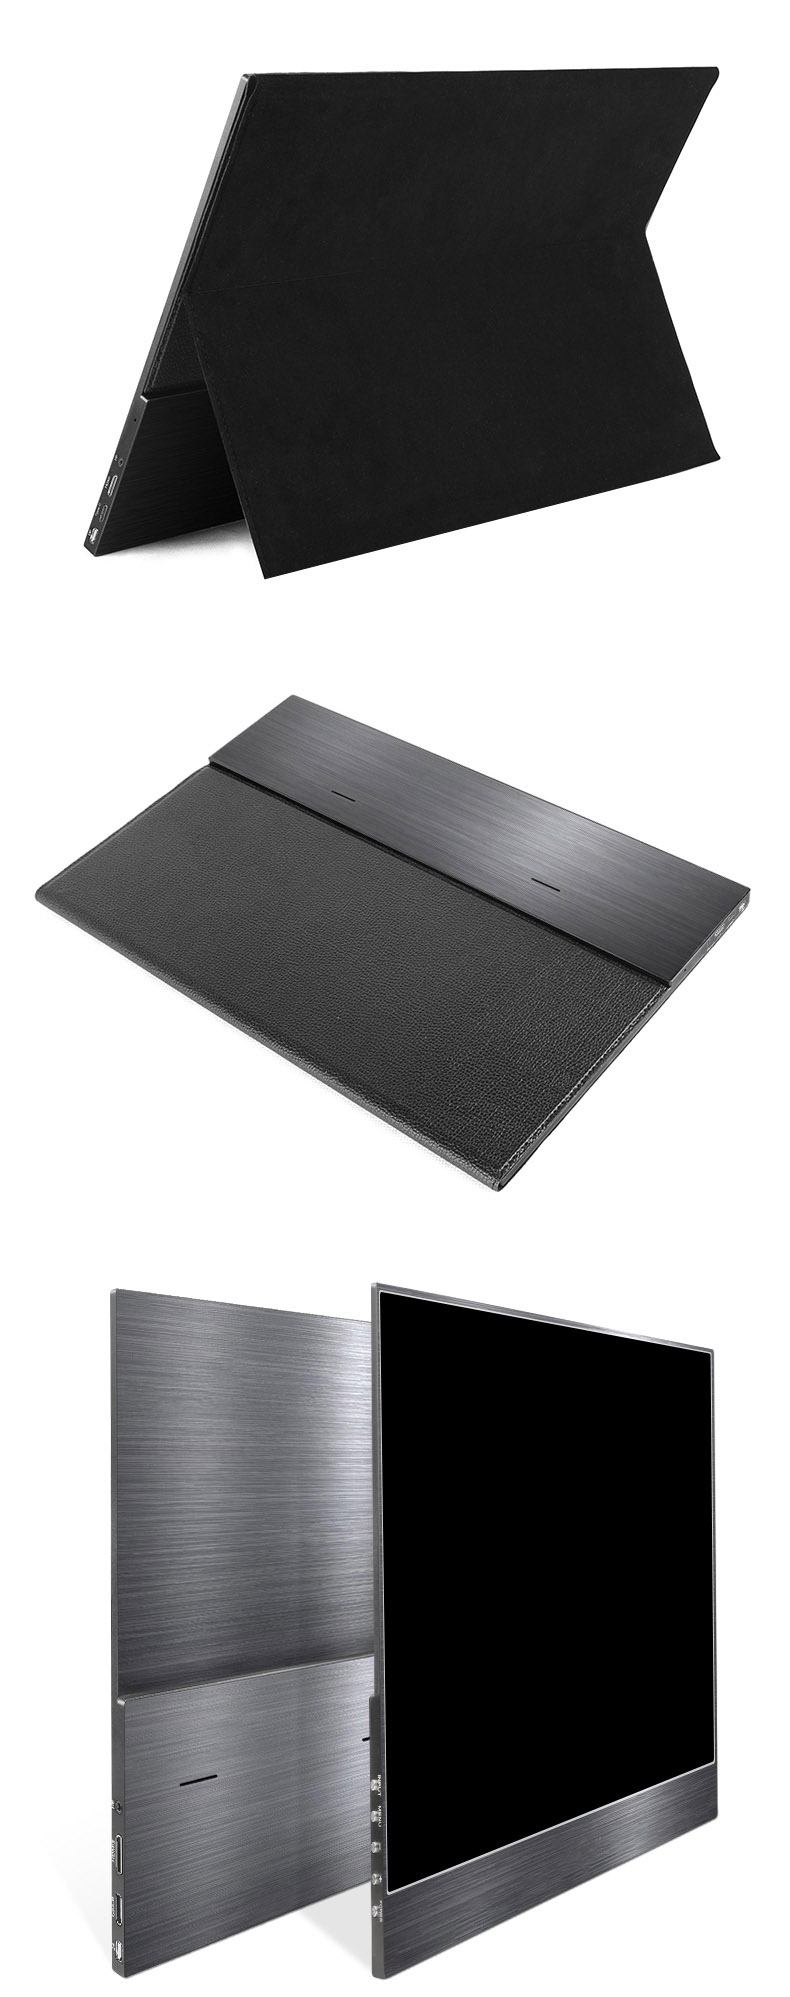 IPS Full HD 15.6吋超輕薄便攜式顯示器